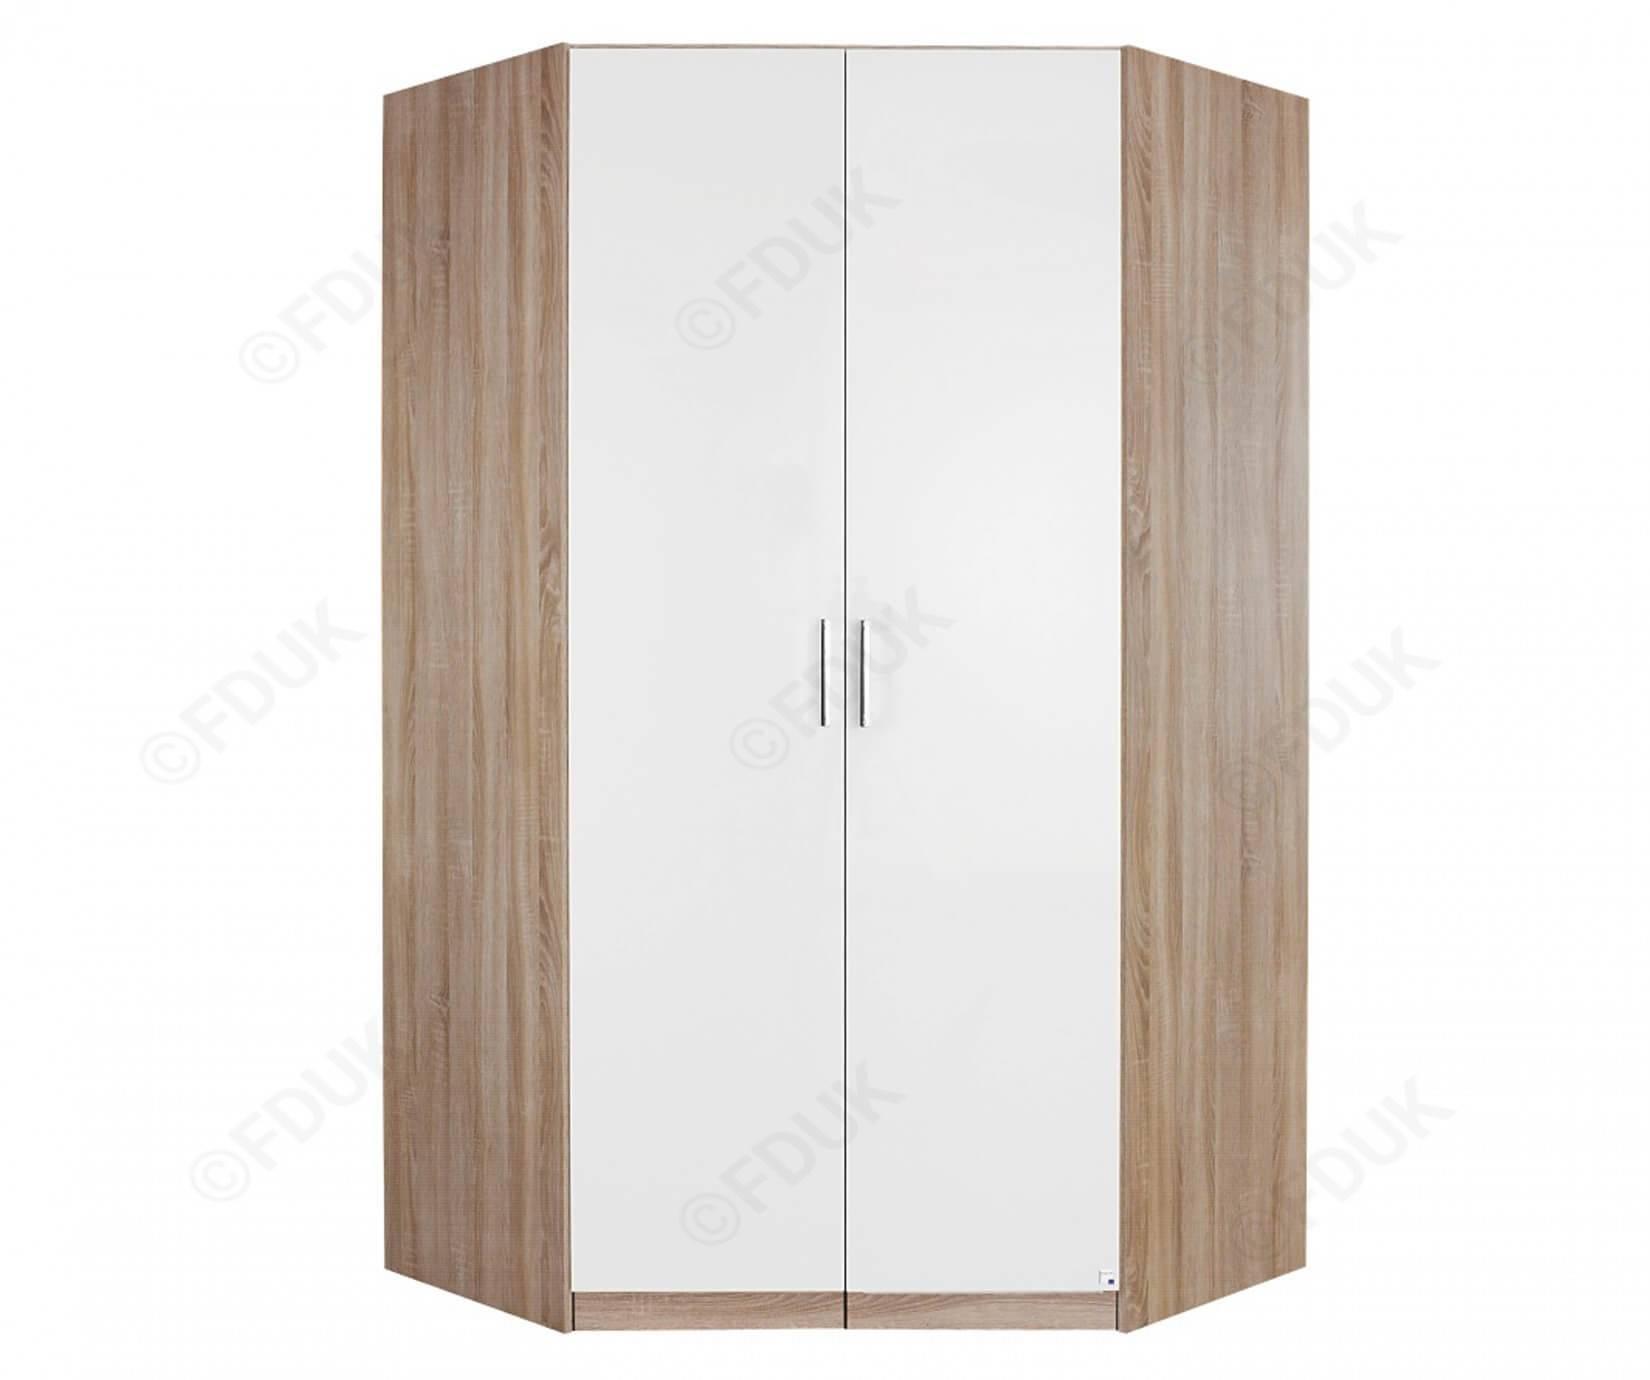 Rauch Furniture Samos | Samos Single Door Corner Wardrobe For 1 Door Corner Wardrobes (View 3 of 15)